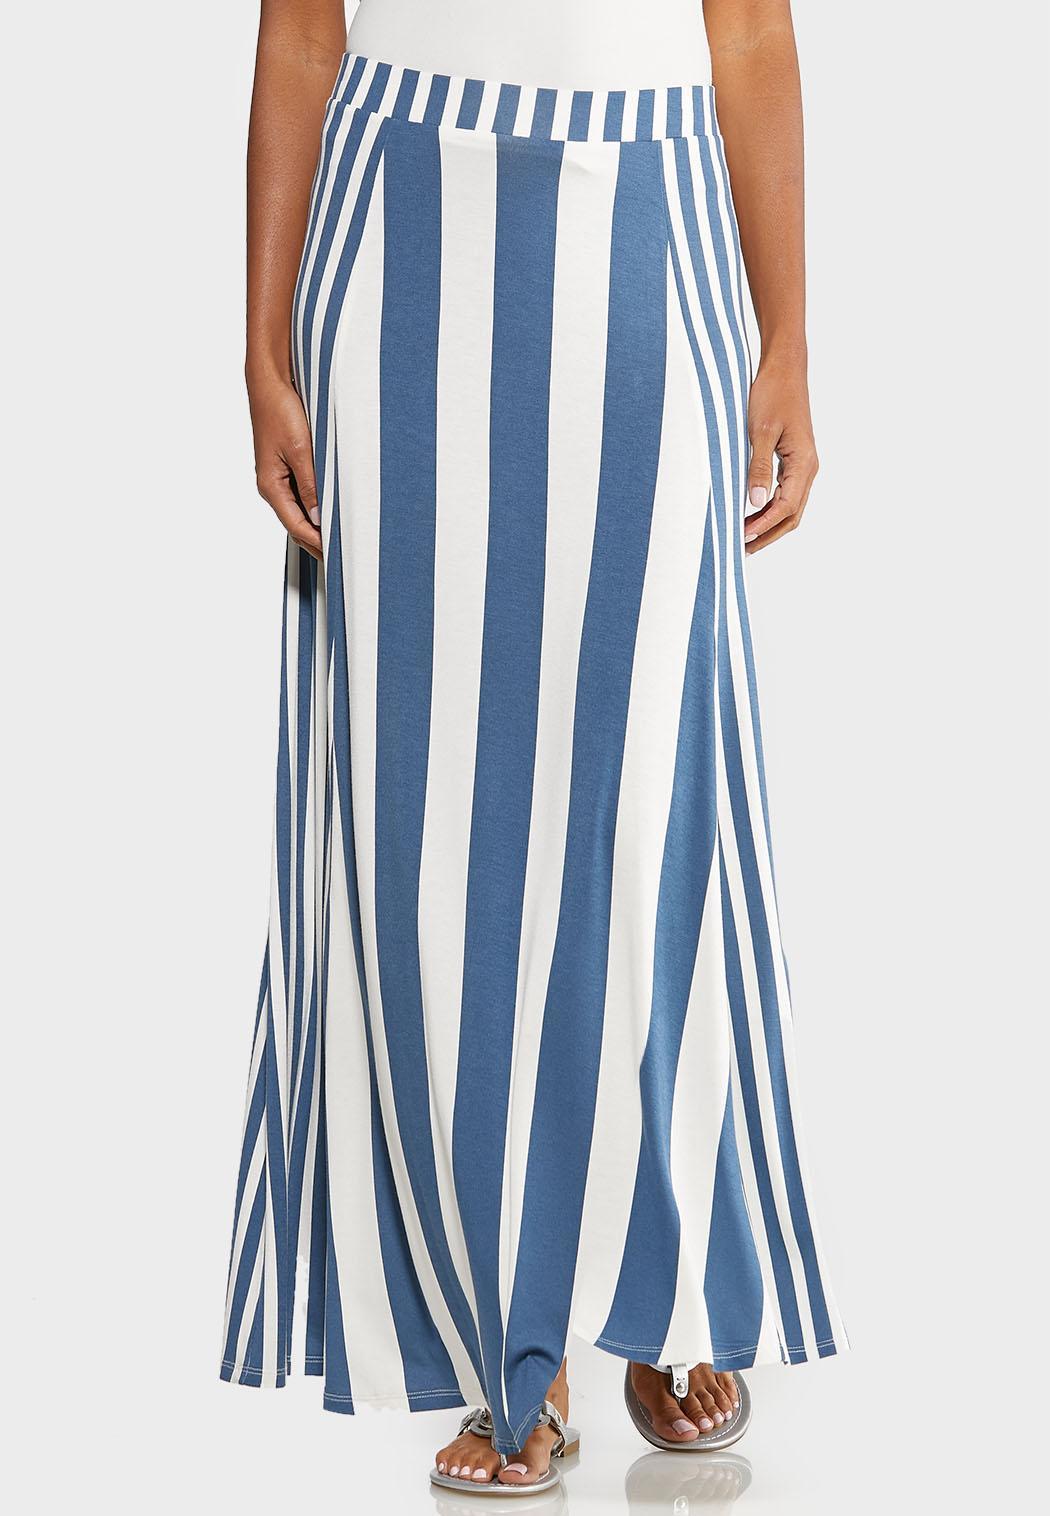 Sailor Stripe Maxi Skirt